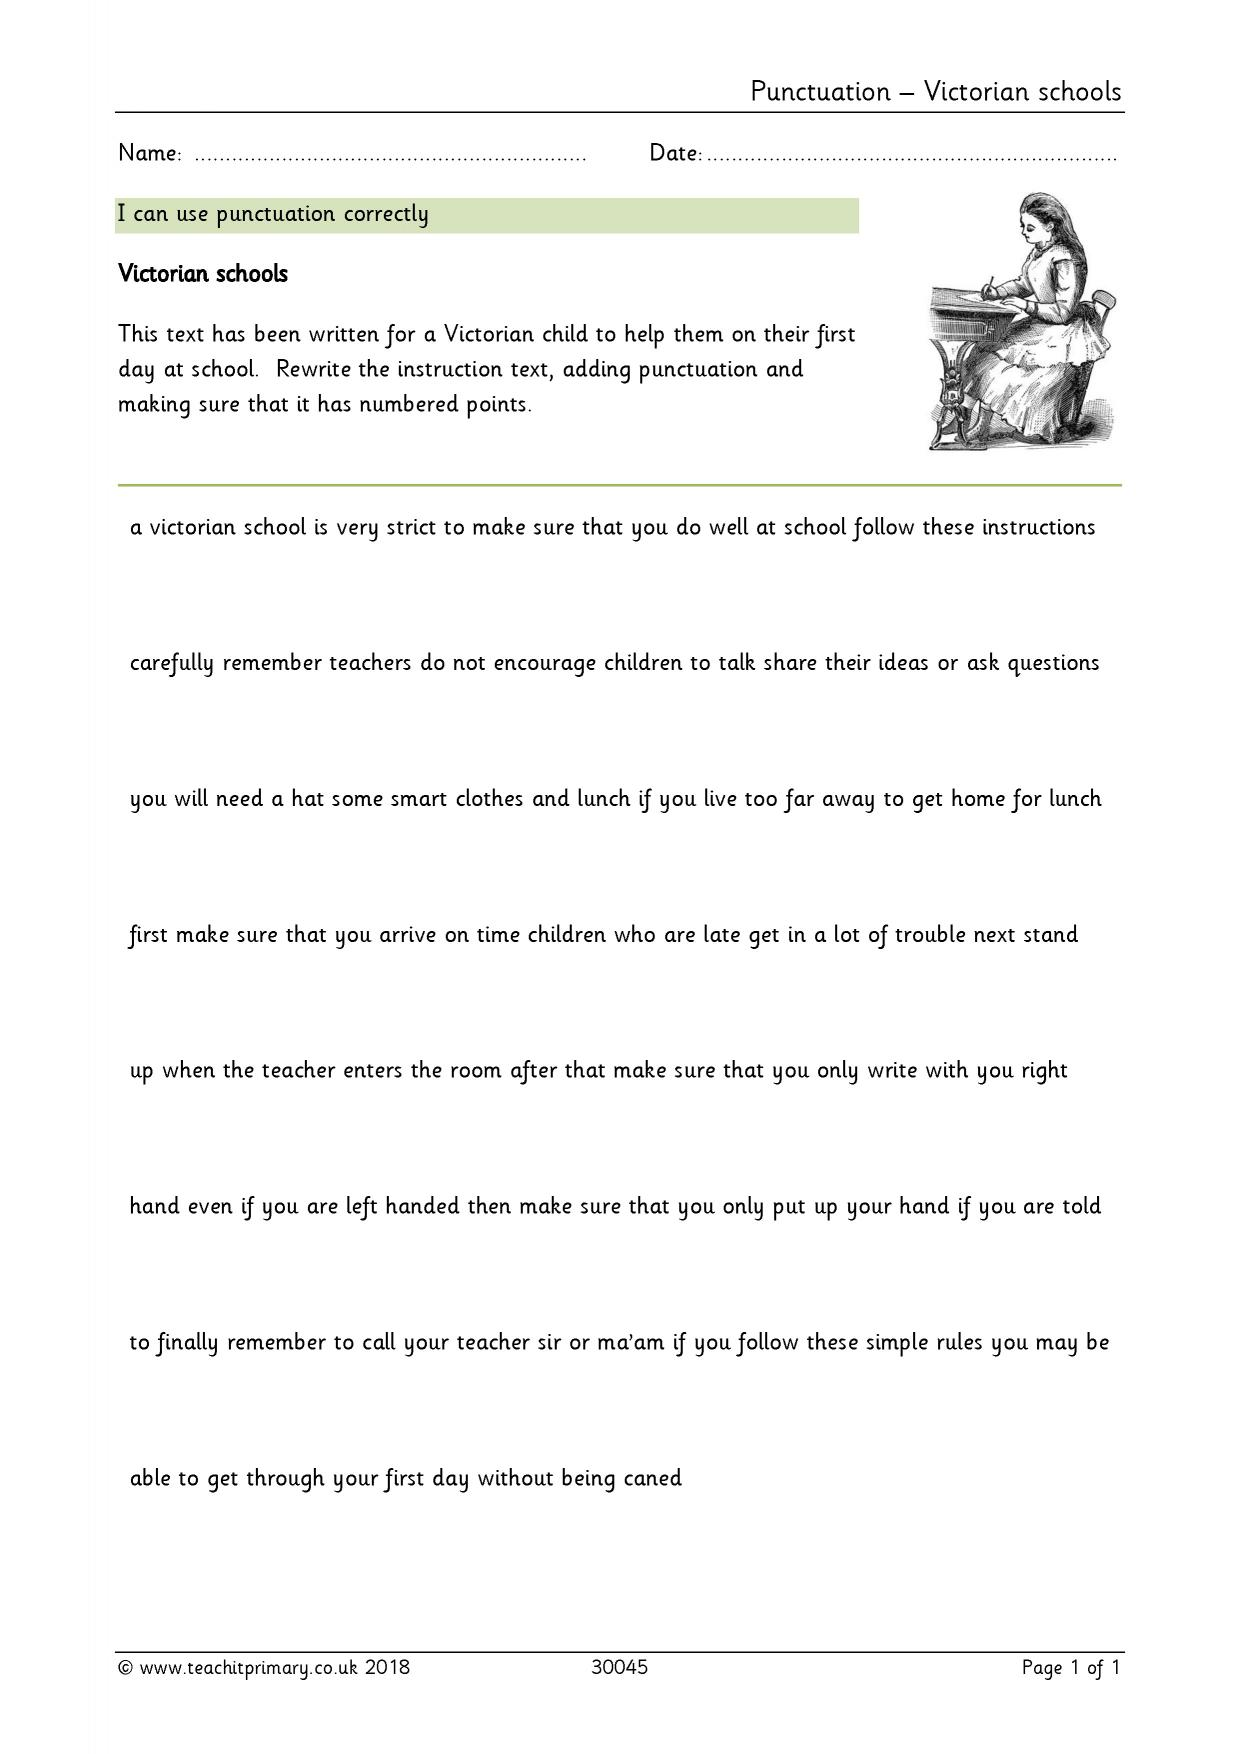 100 Quotation Marks Ks1 – Semicolon Worksheet